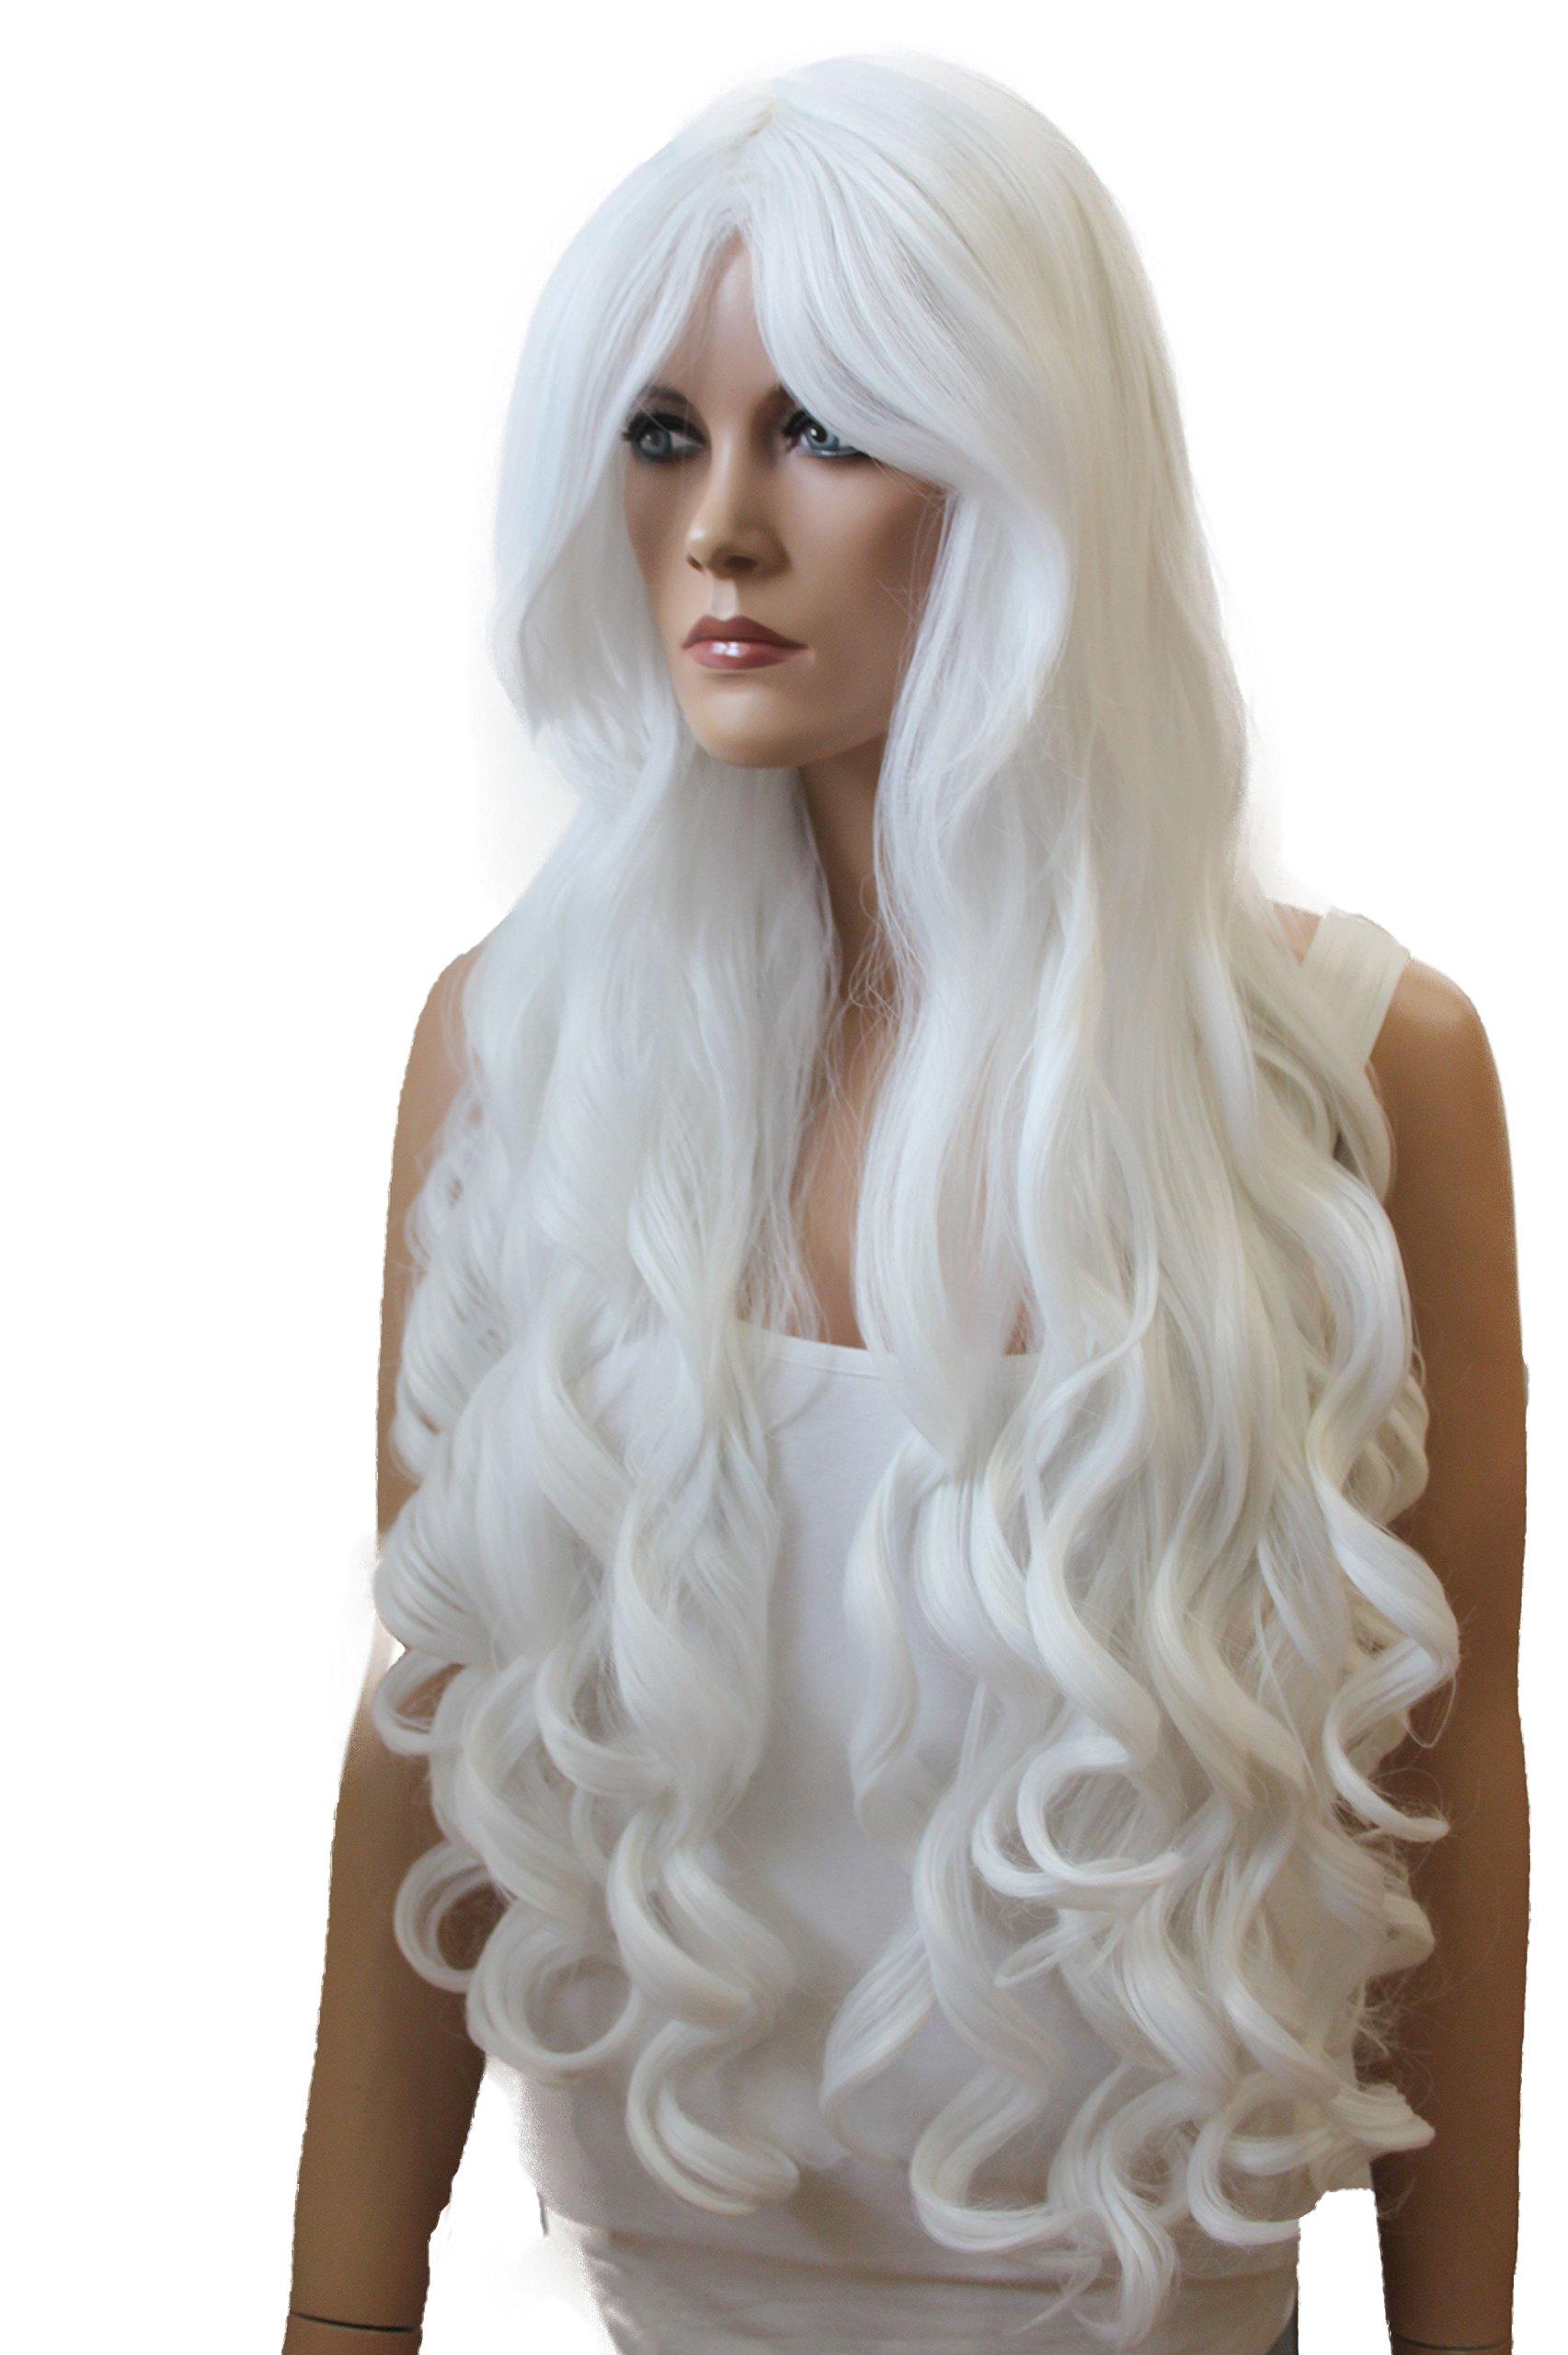 PRETTYSHOP Peluca de pelo largo rizado de fibra sintética resistente al calor rubio CP12 product image